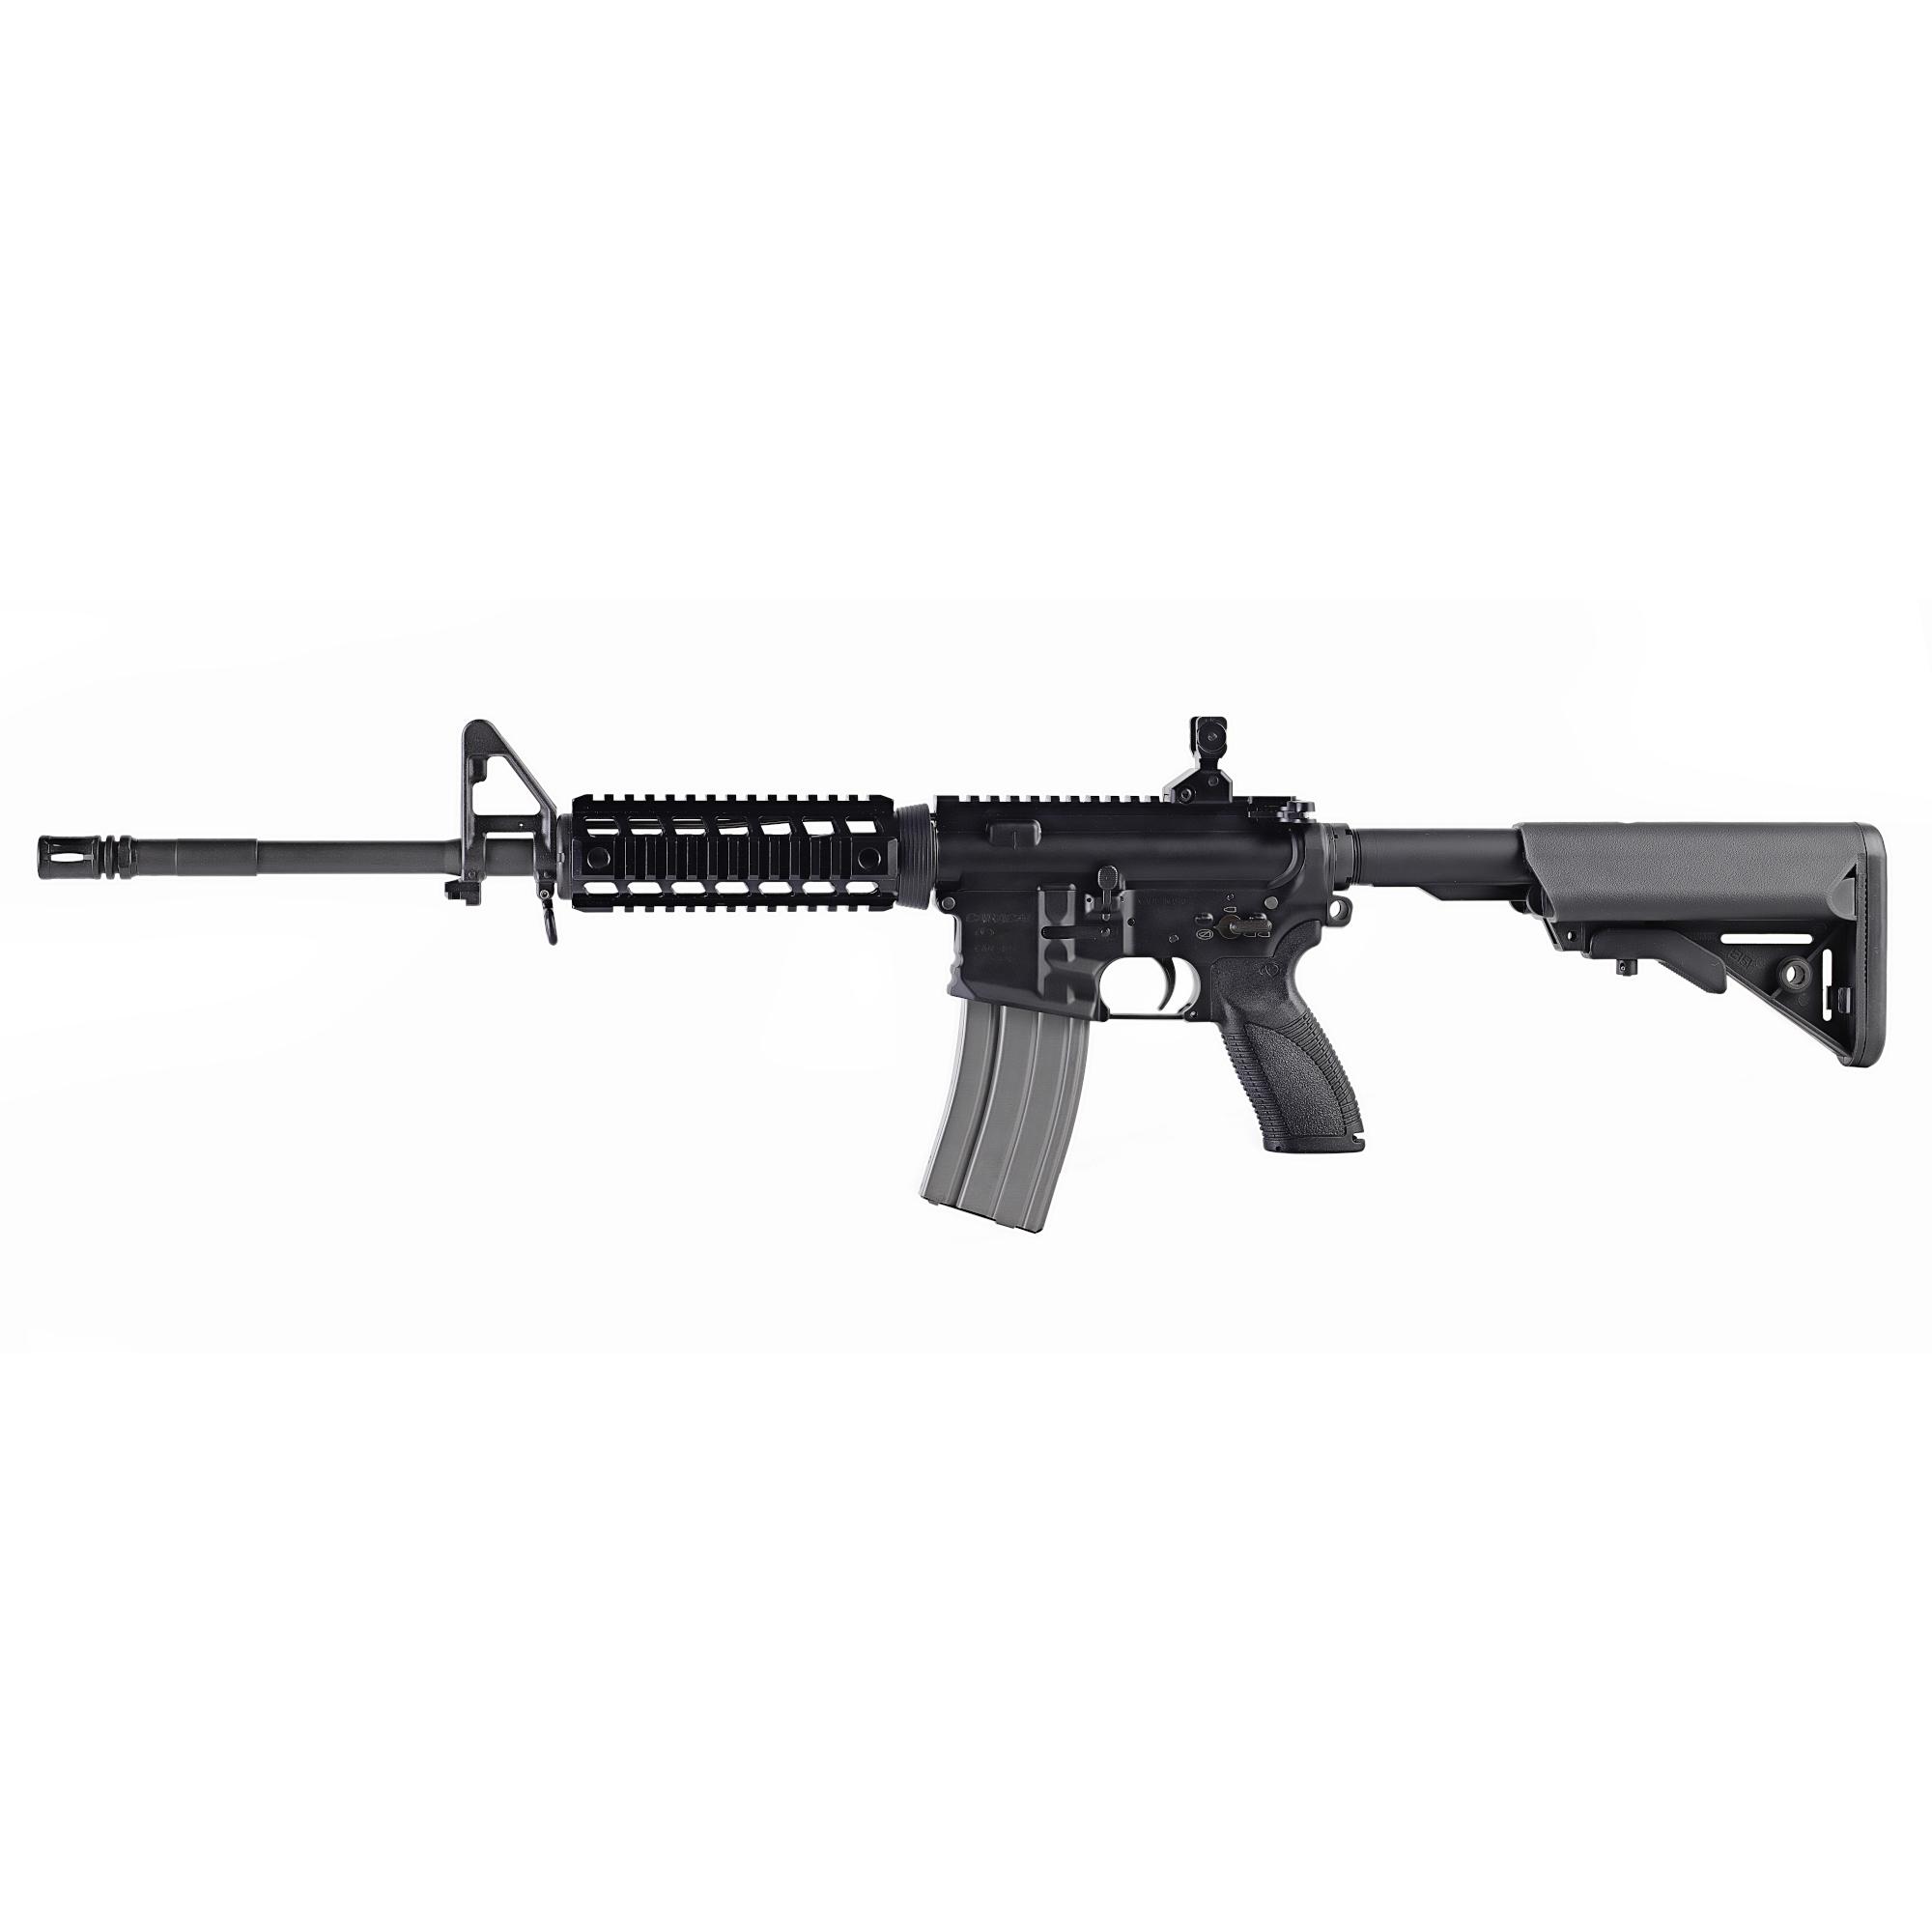 Carbine 16